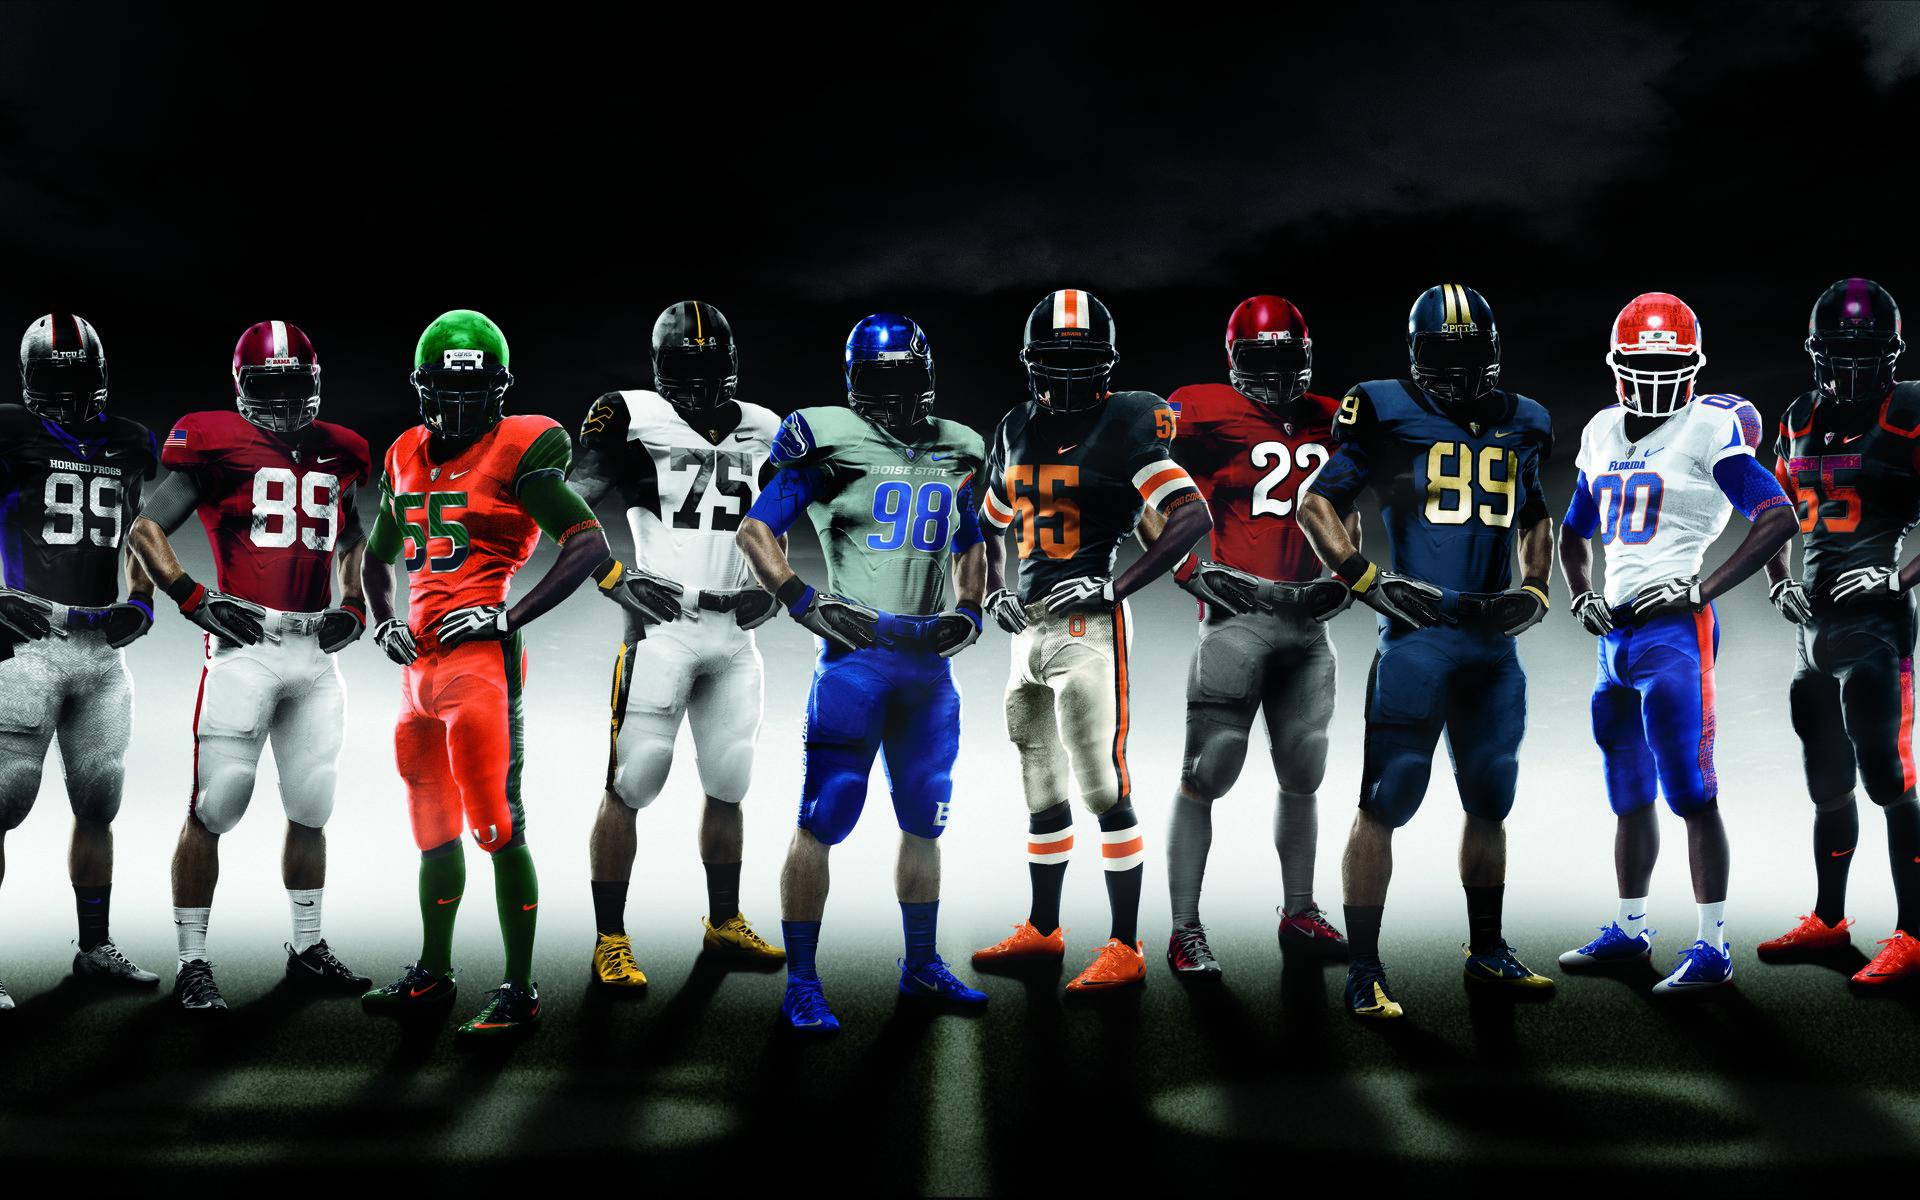 1920x1200 American Football Player Wallpaper